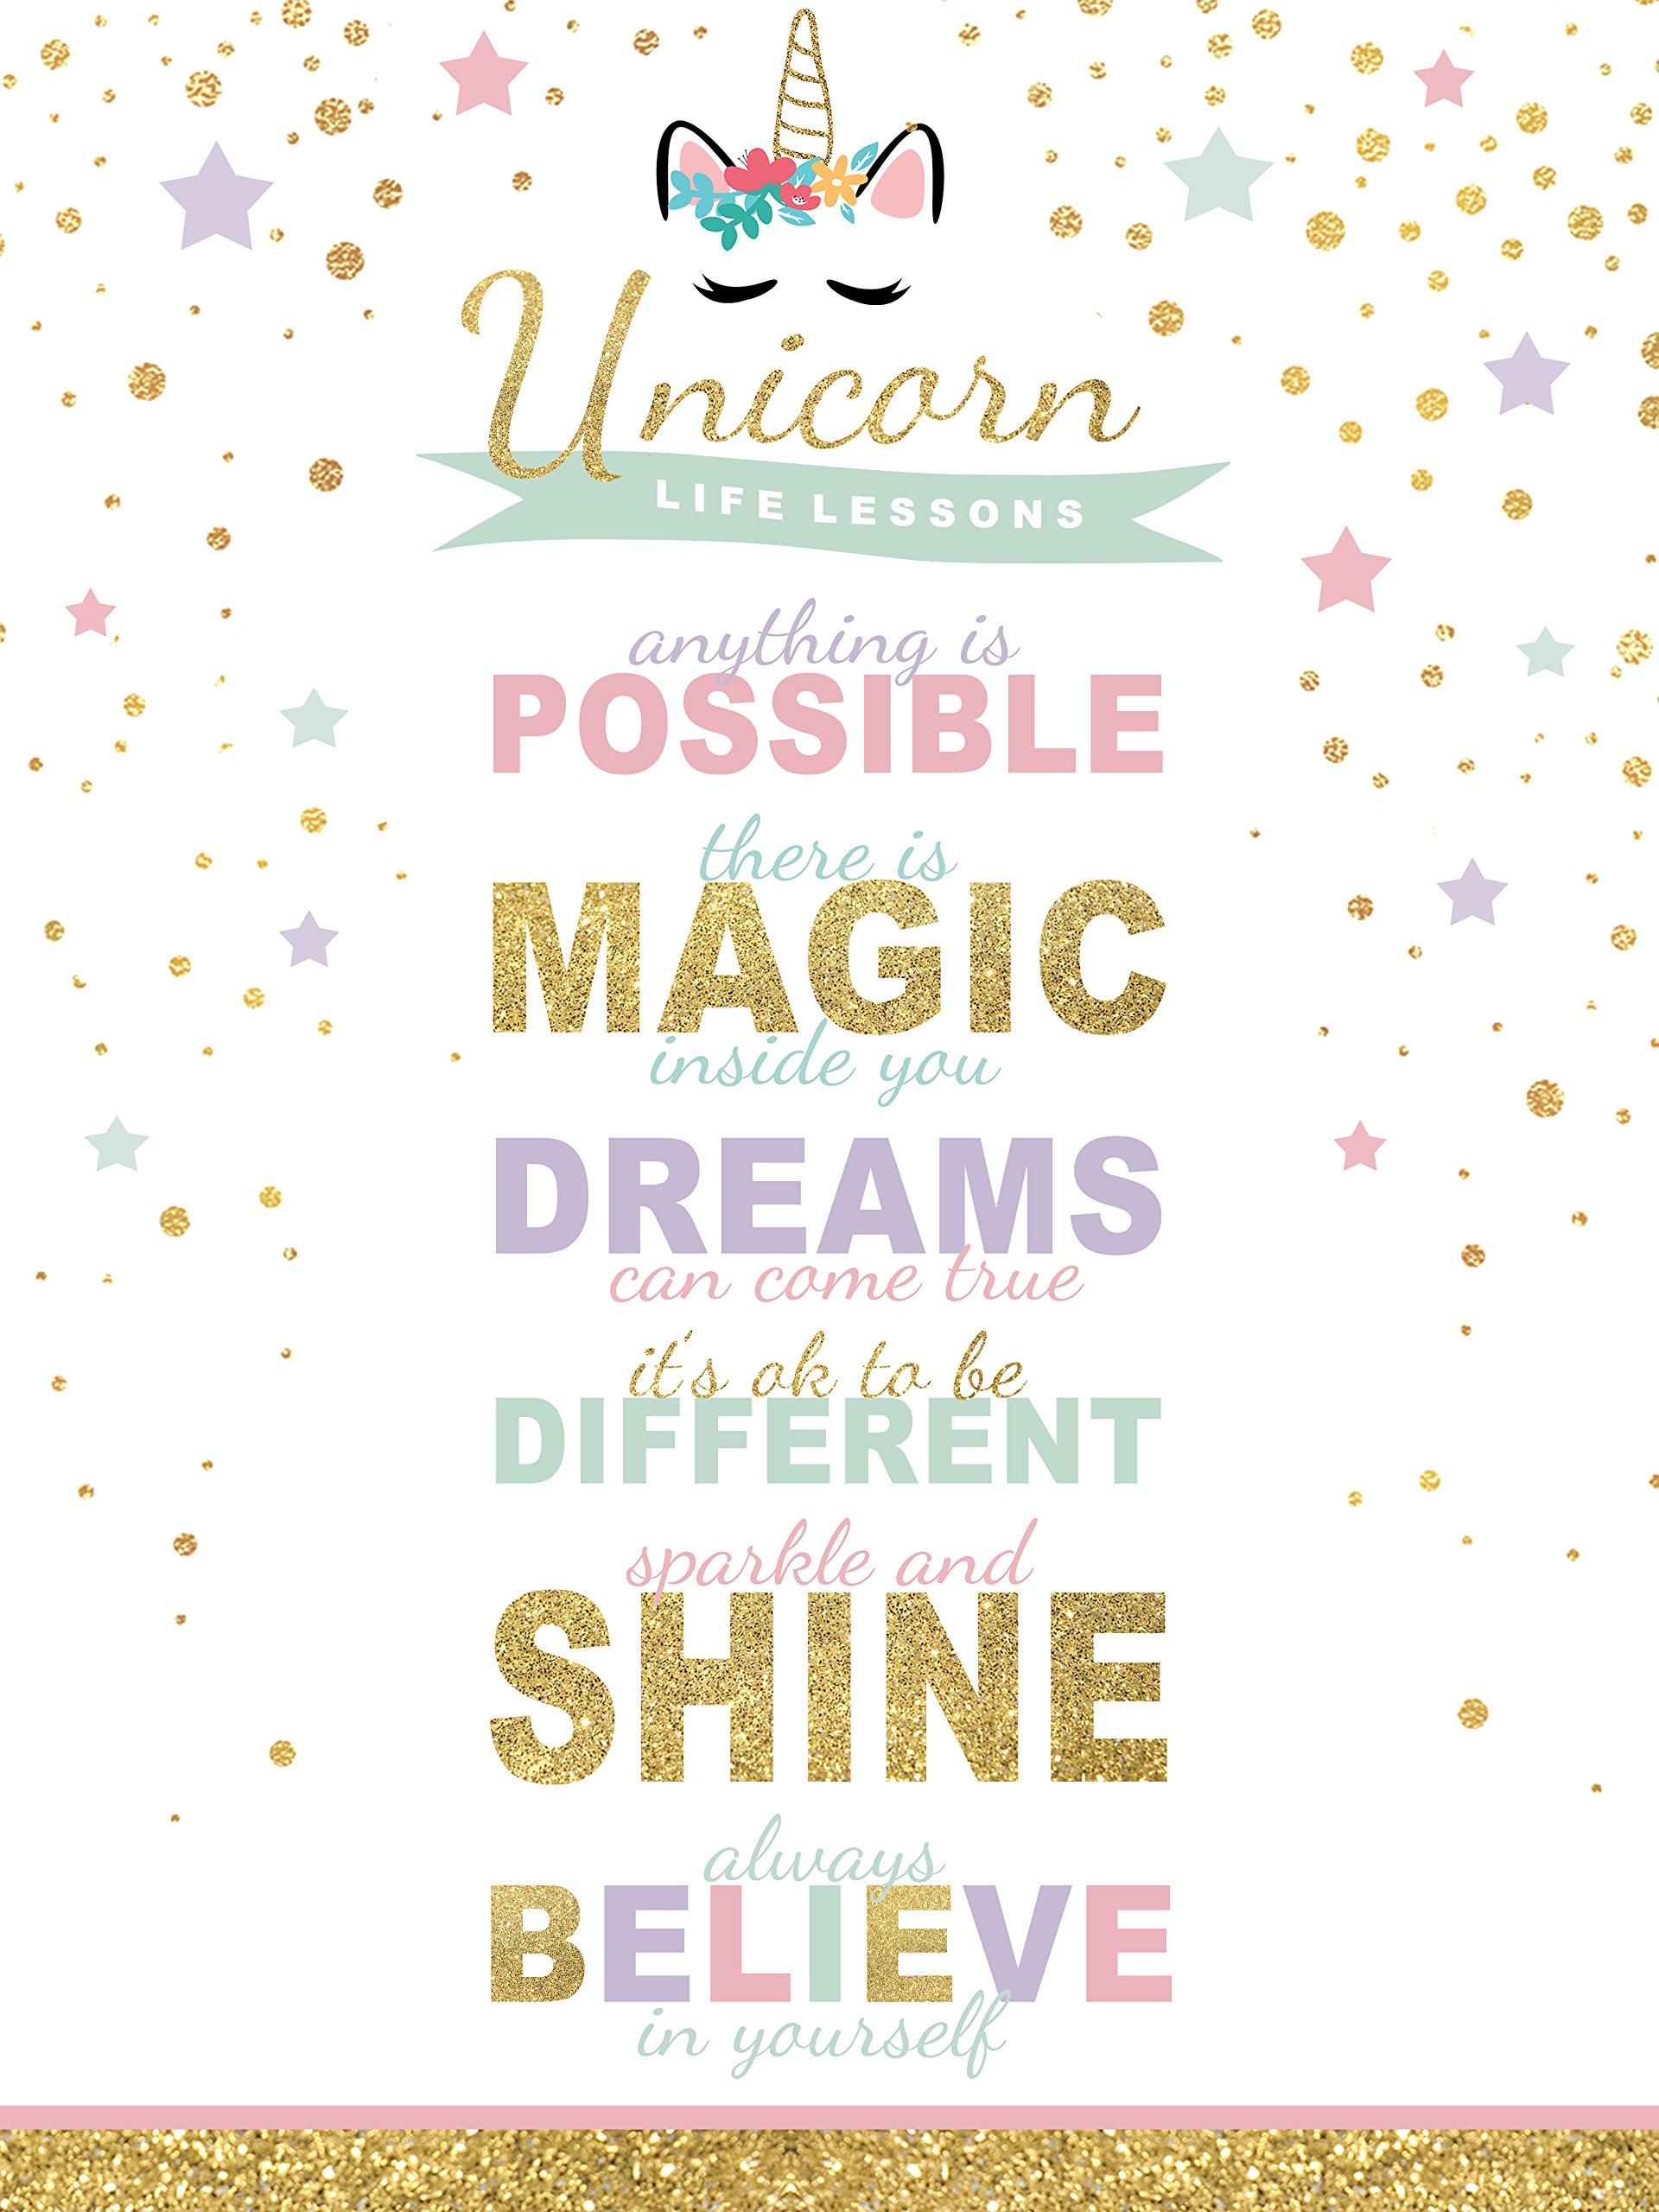 wallsthatspeak Girl's Room Unicorn Magic Life Lessons - Unframed Rainbow Sparkle 12x16 Inch Wall Decor Art Print Poster